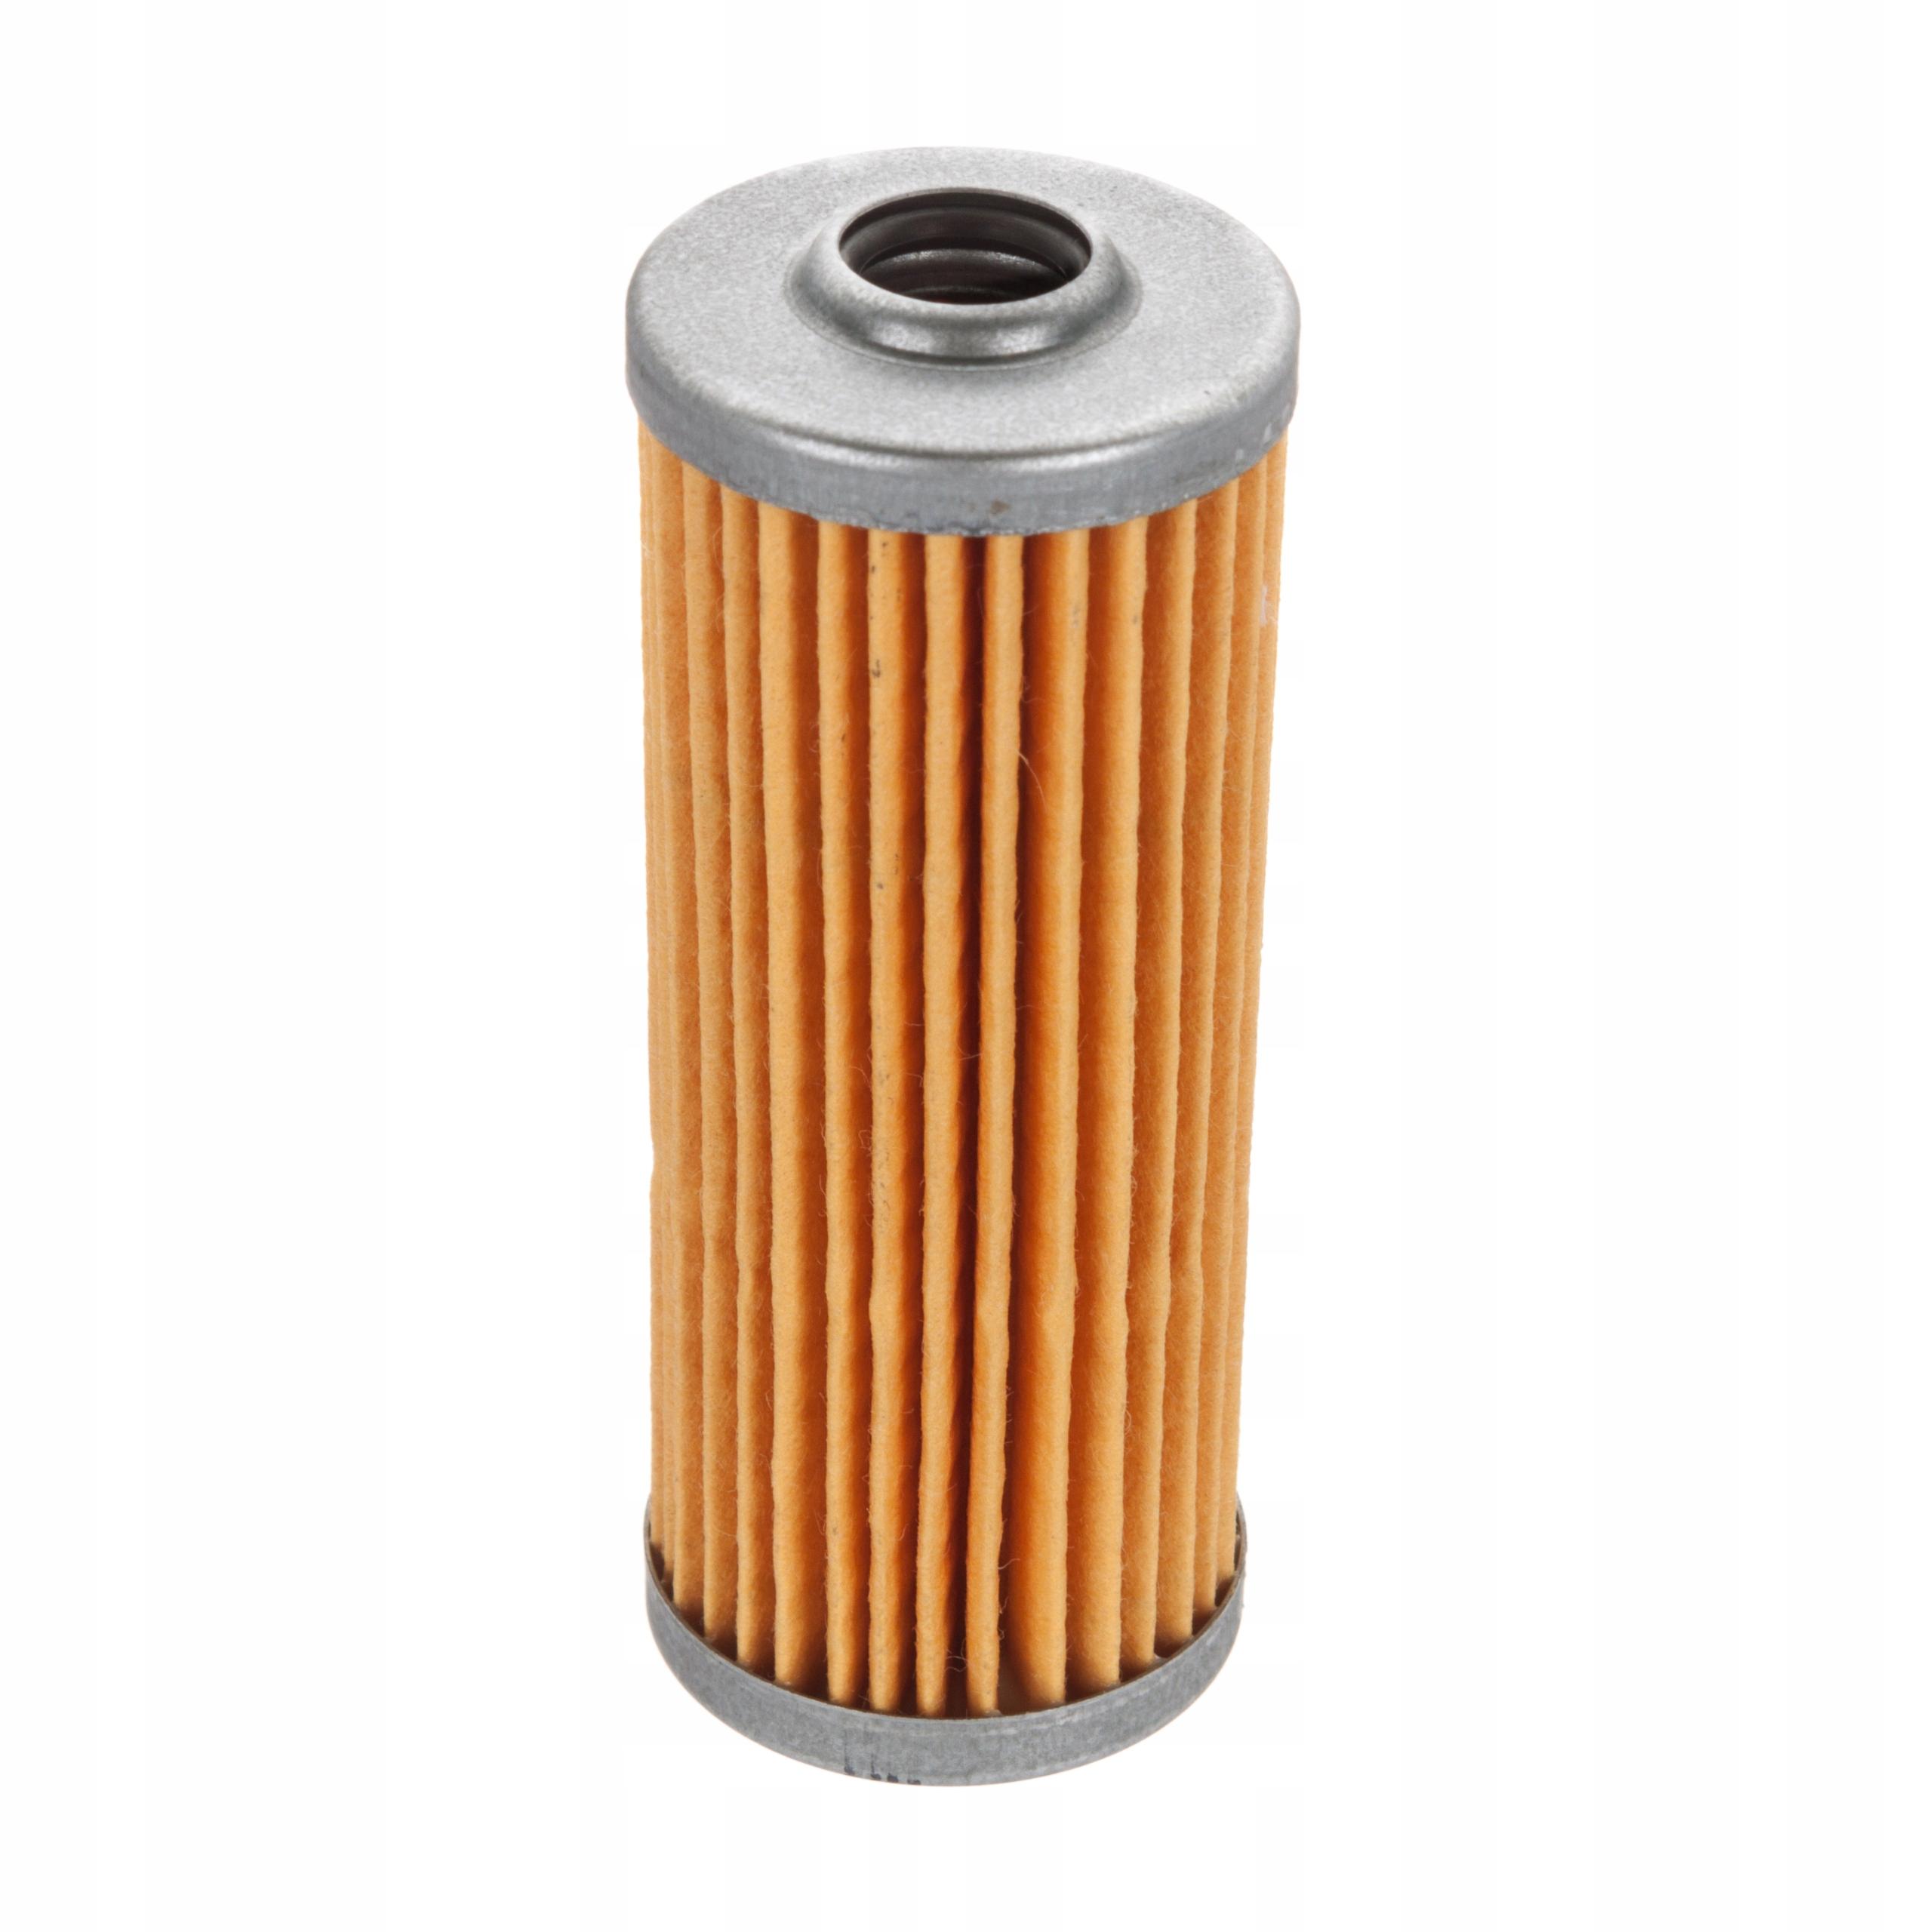 Donaldson P502166 Filter